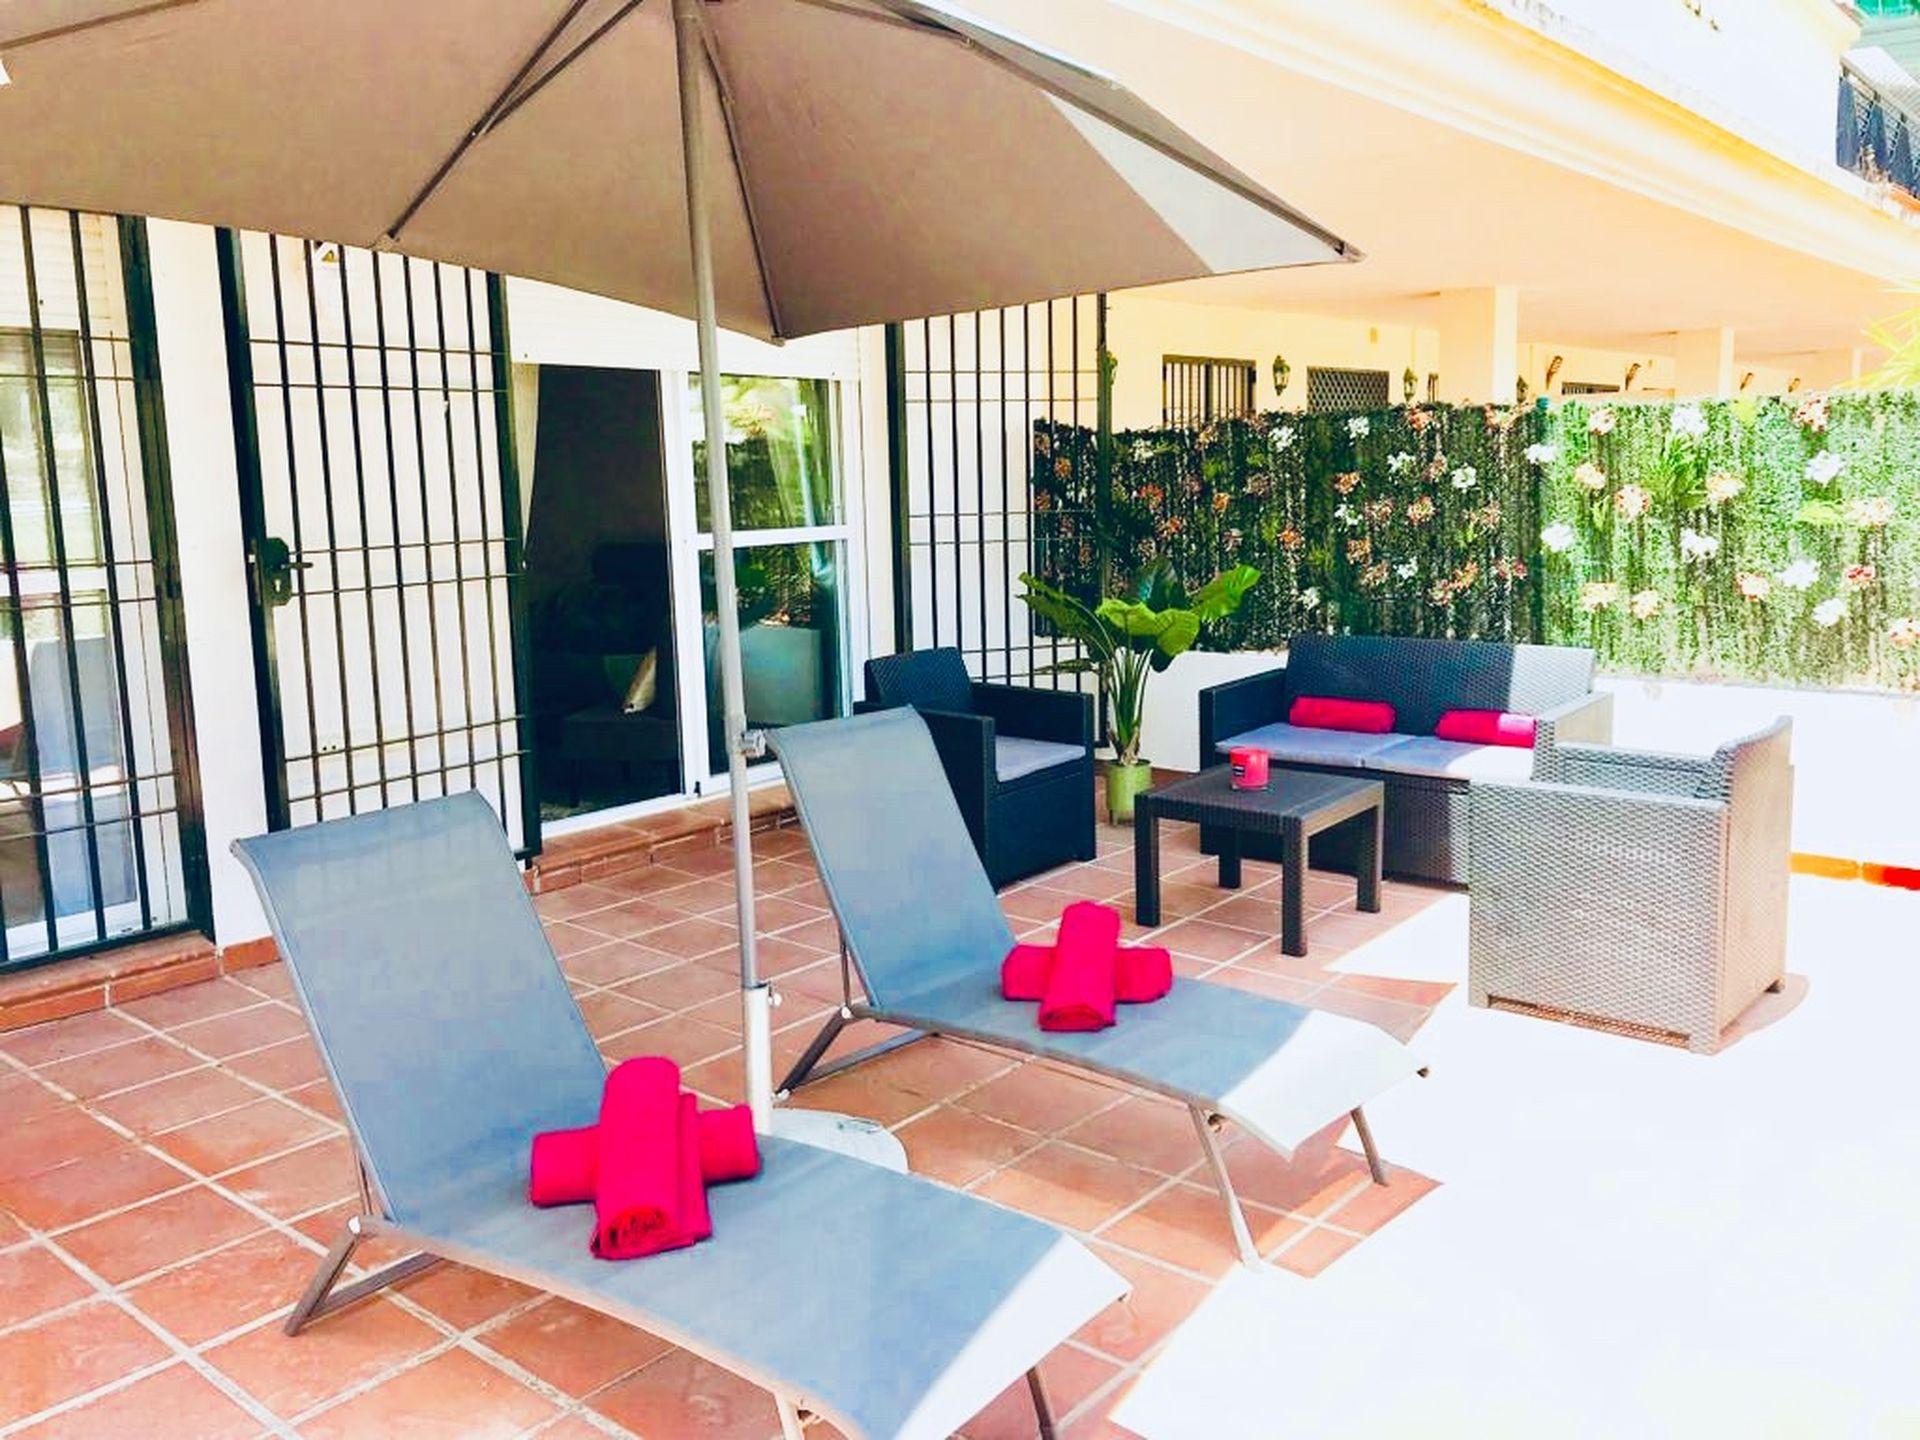 Leisure Joy Nueva Andalucia by Rafleys - Beautiful Newly Refurbished 2BR Garden Suite in Lorcrimar